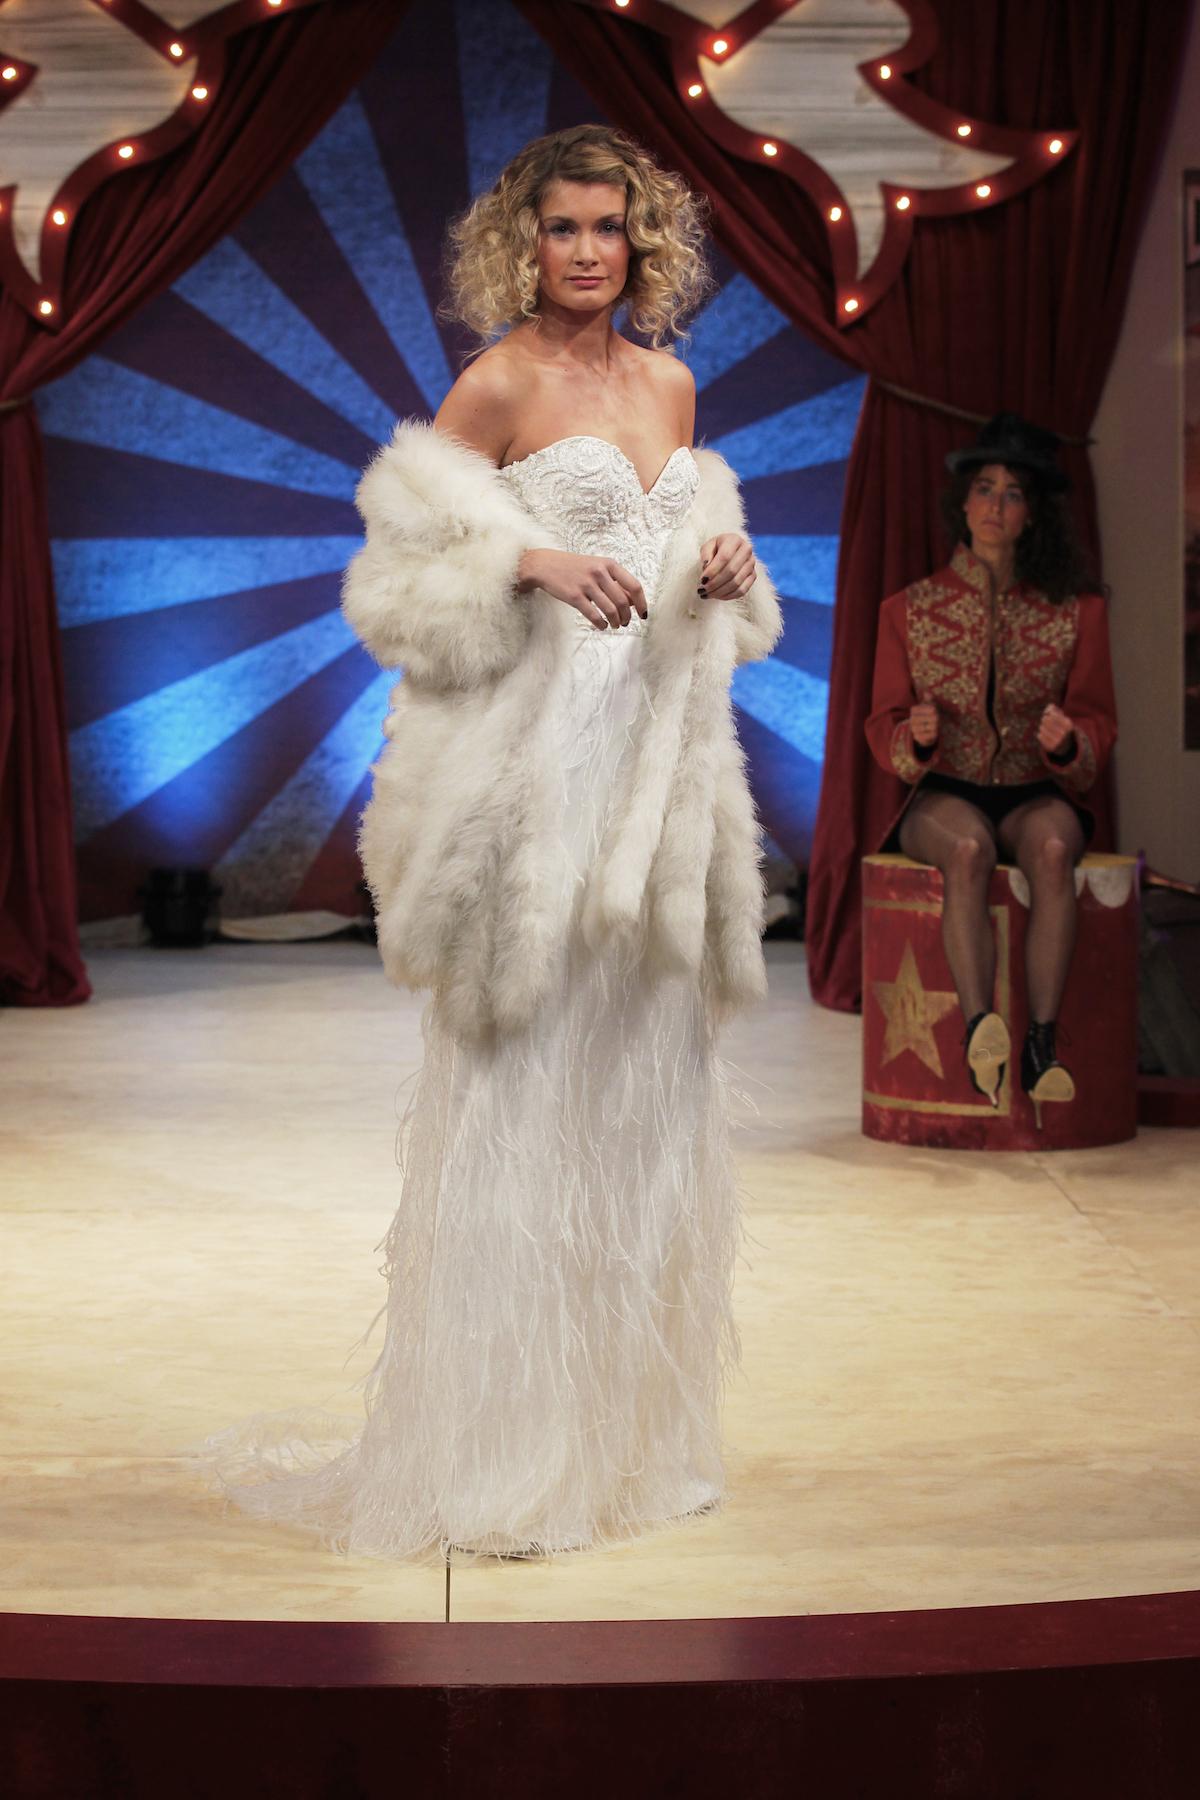 Dita beaded corset & Maribou skirt and jacket   Halfpenny London wedding dress on the Brides the Show catwalk